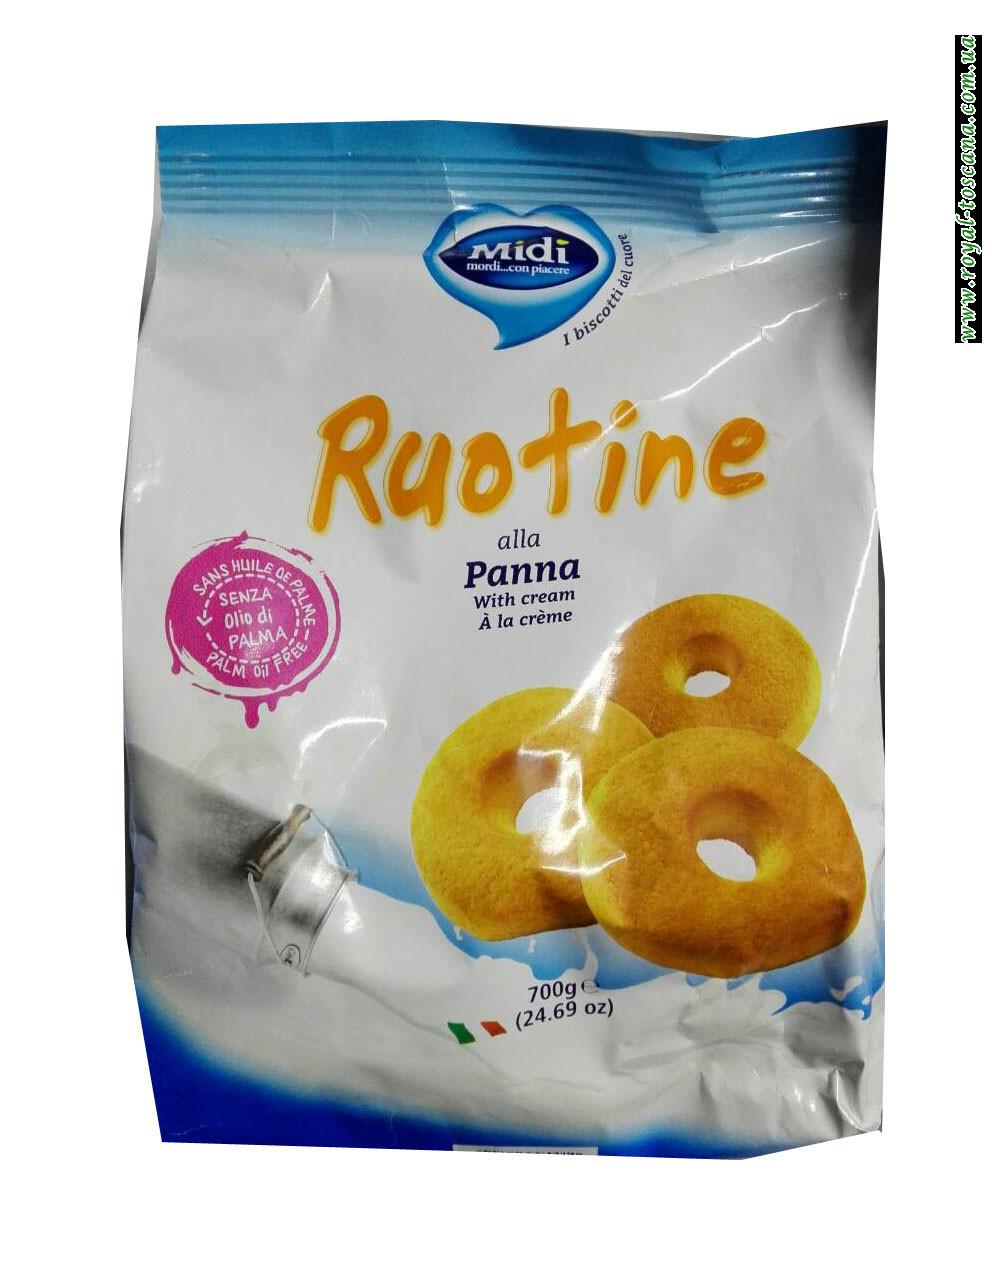 Печенье Midi Ruotine alla Panna